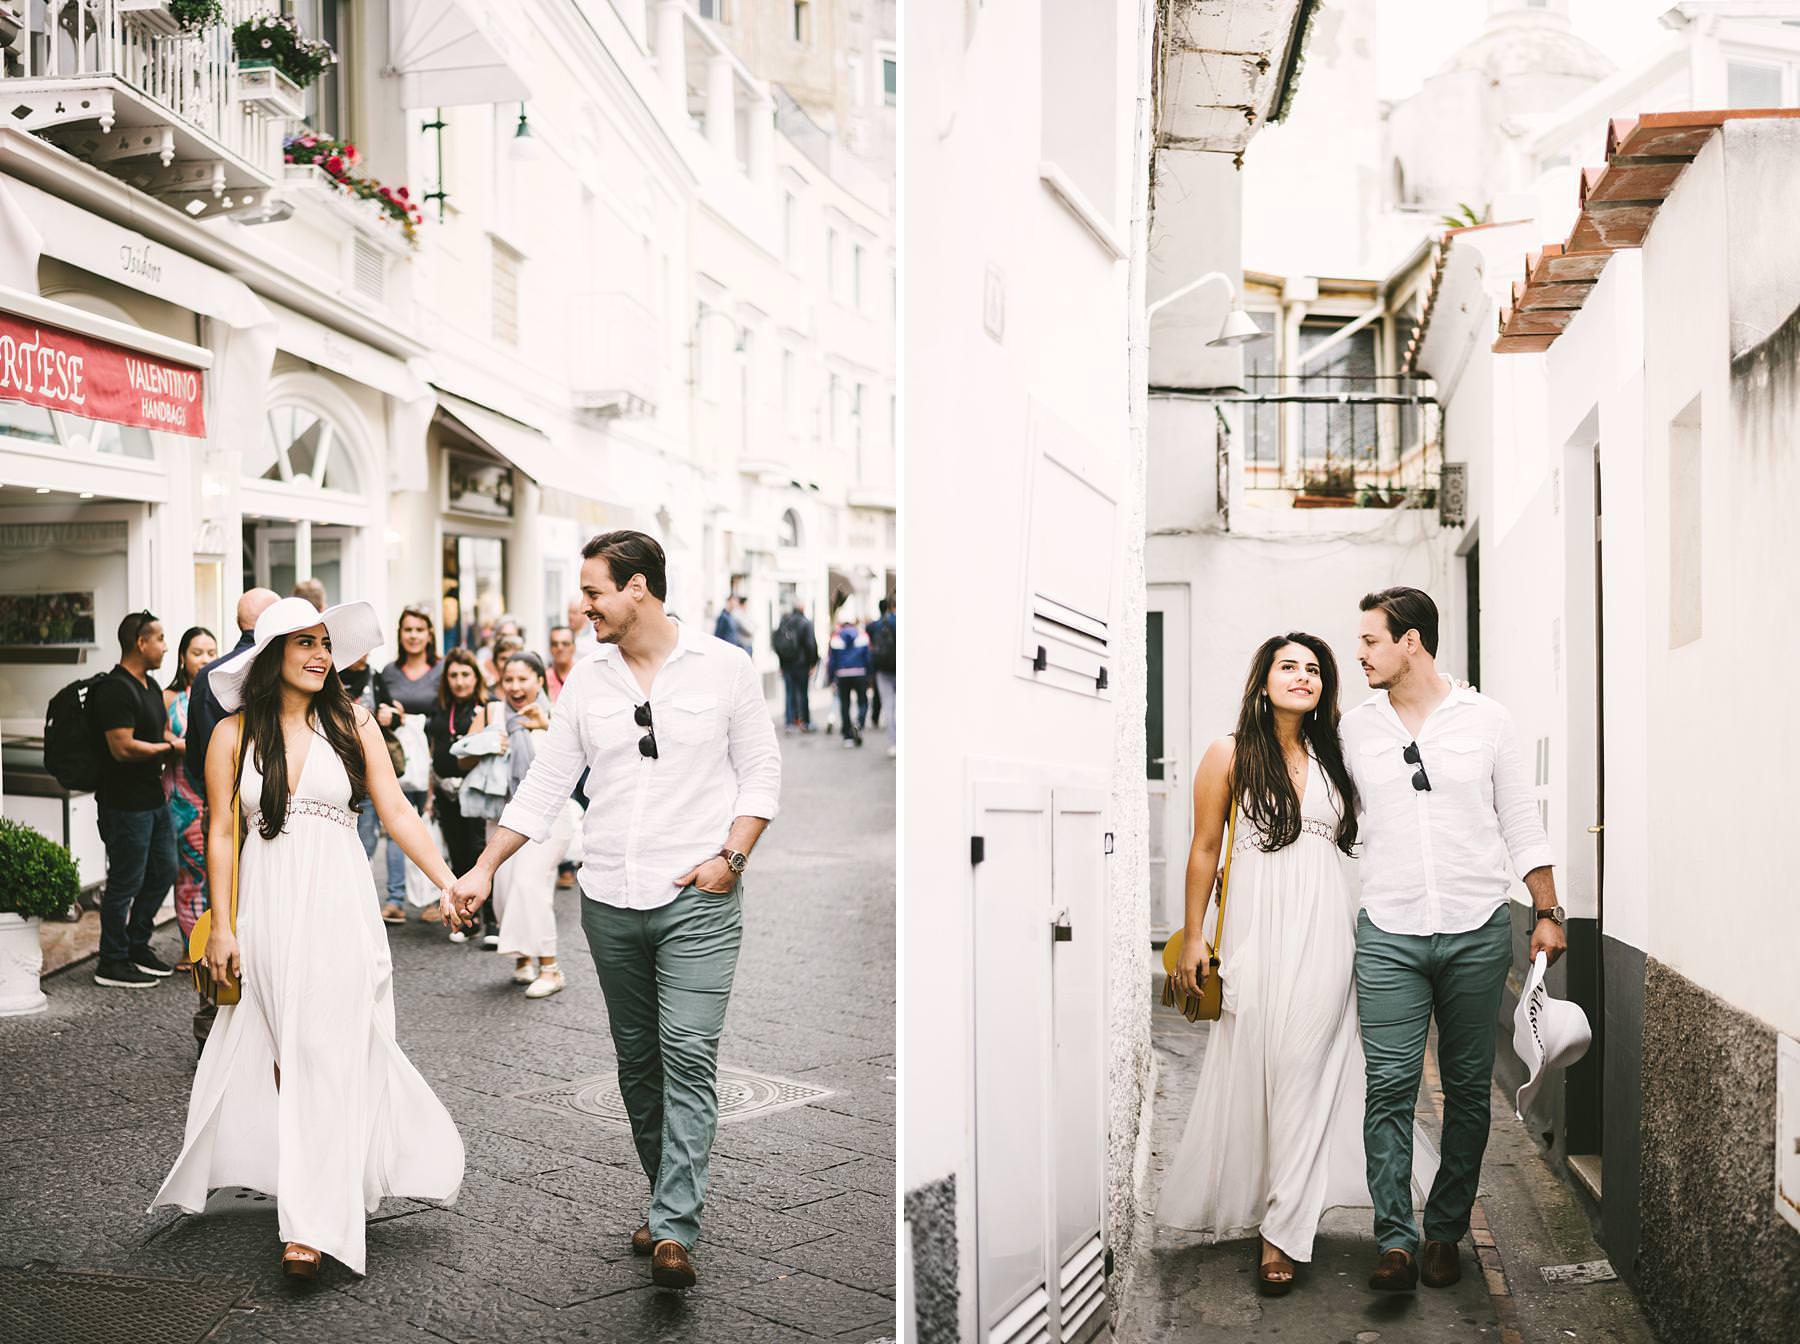 Dreamy and romantic couple portrait engagement photo tour in streets of Capri